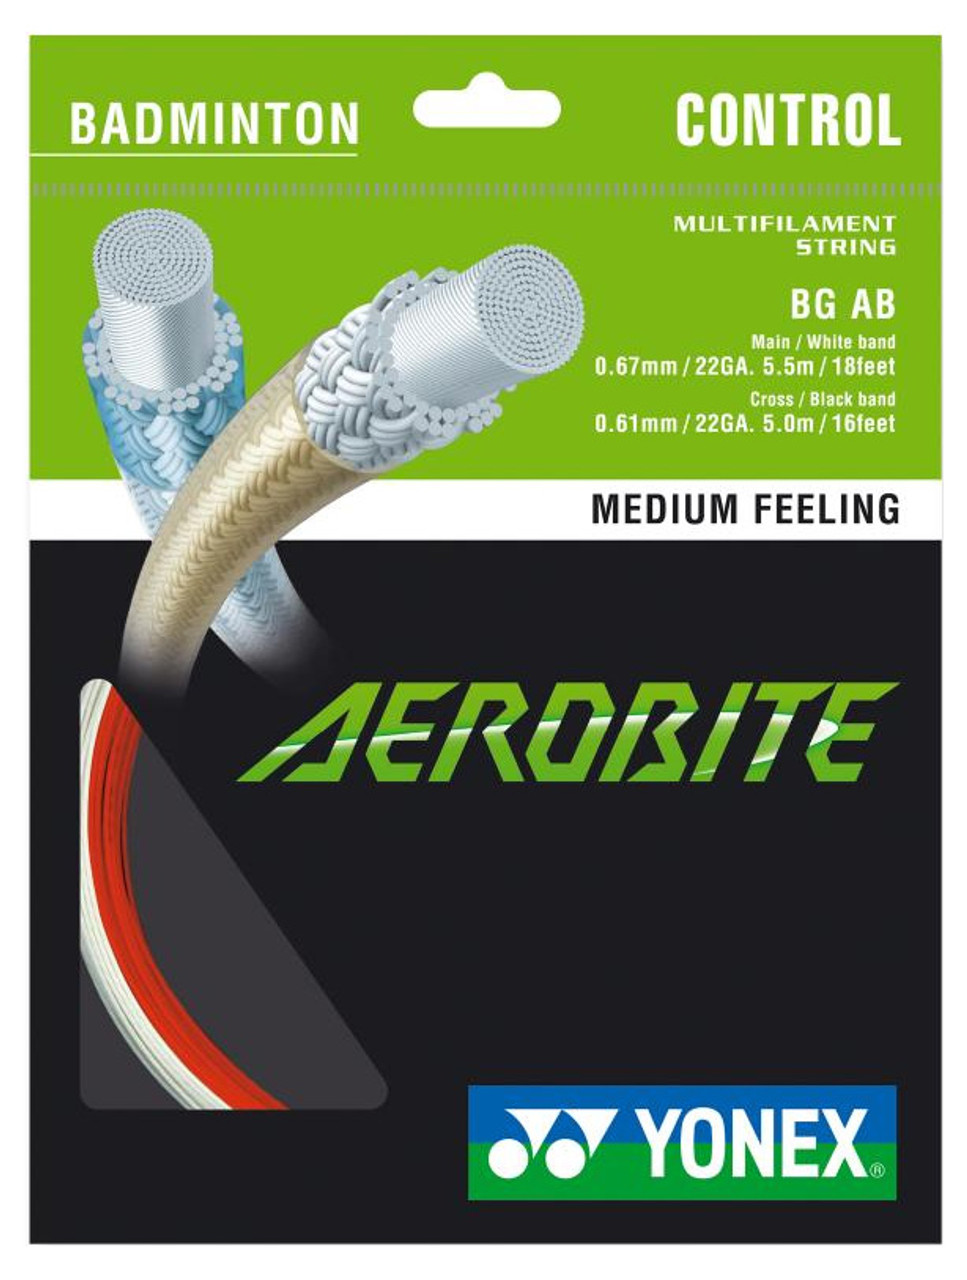 Yonex Aerobite 0.67-0.61mm Badminton Strings Hybrid Set